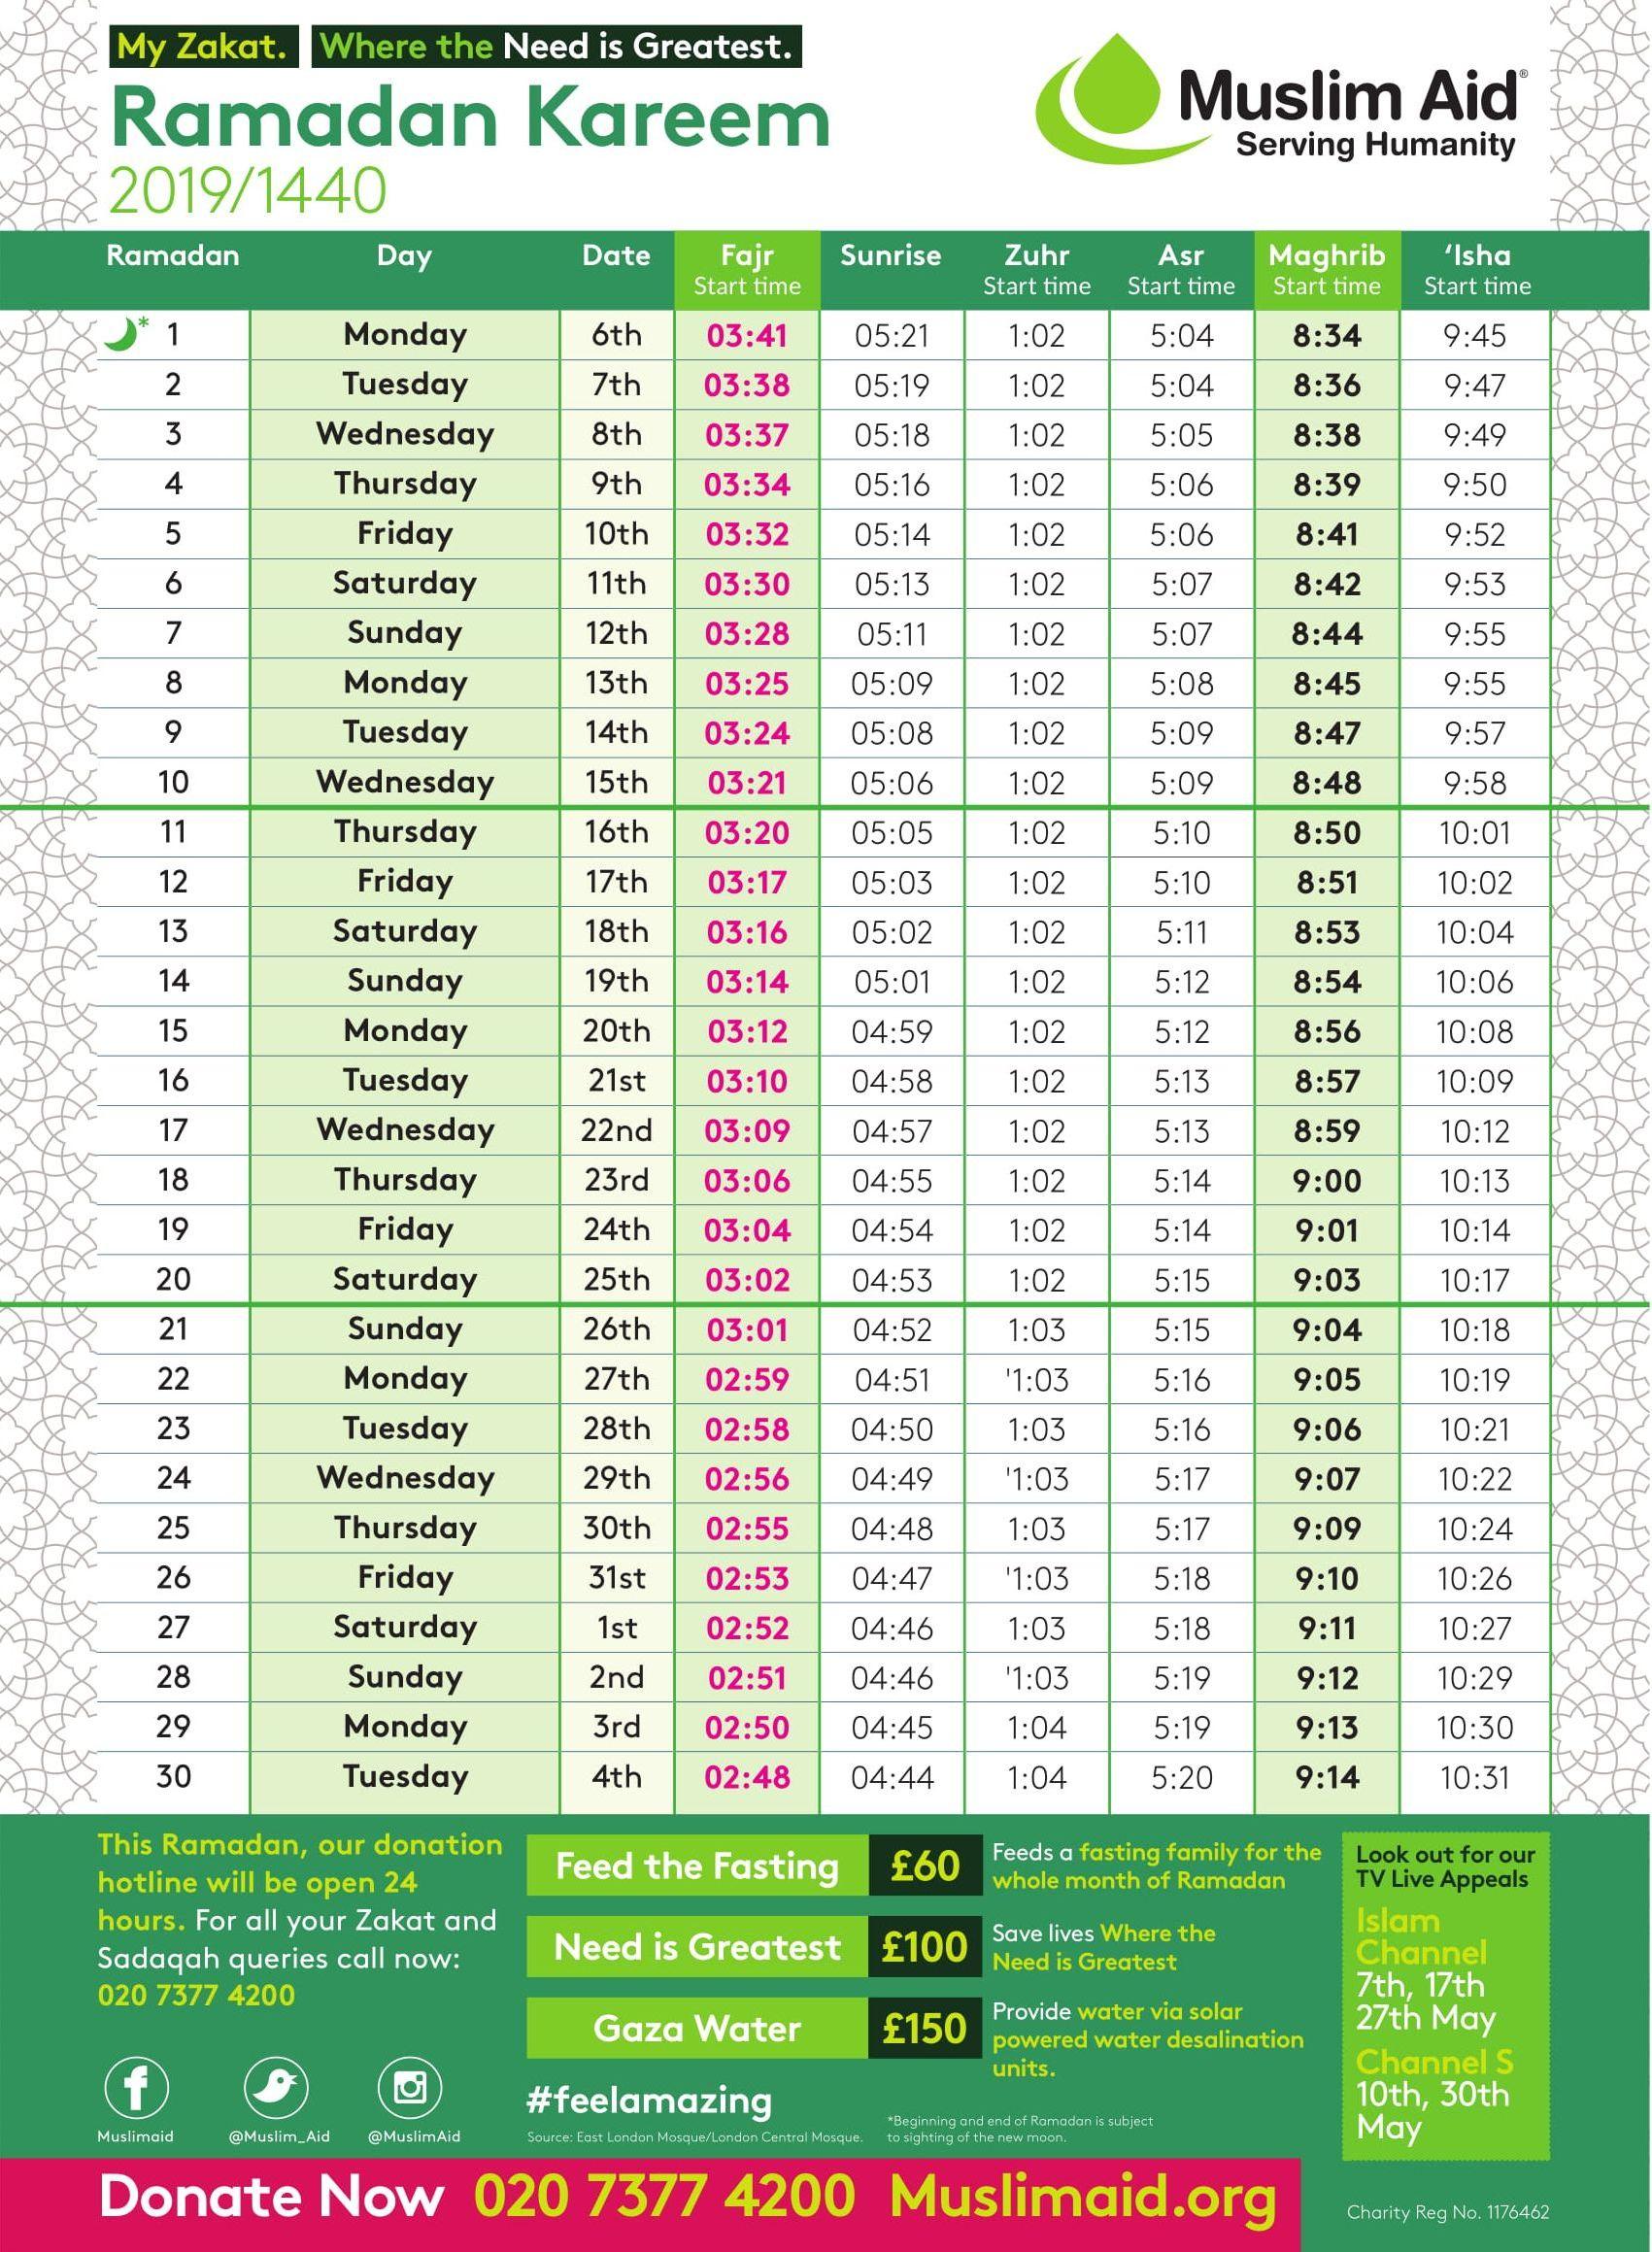 When Is Ramadan 2019?  Ramadan Timetable 2019 in Lunar Calendar Isha